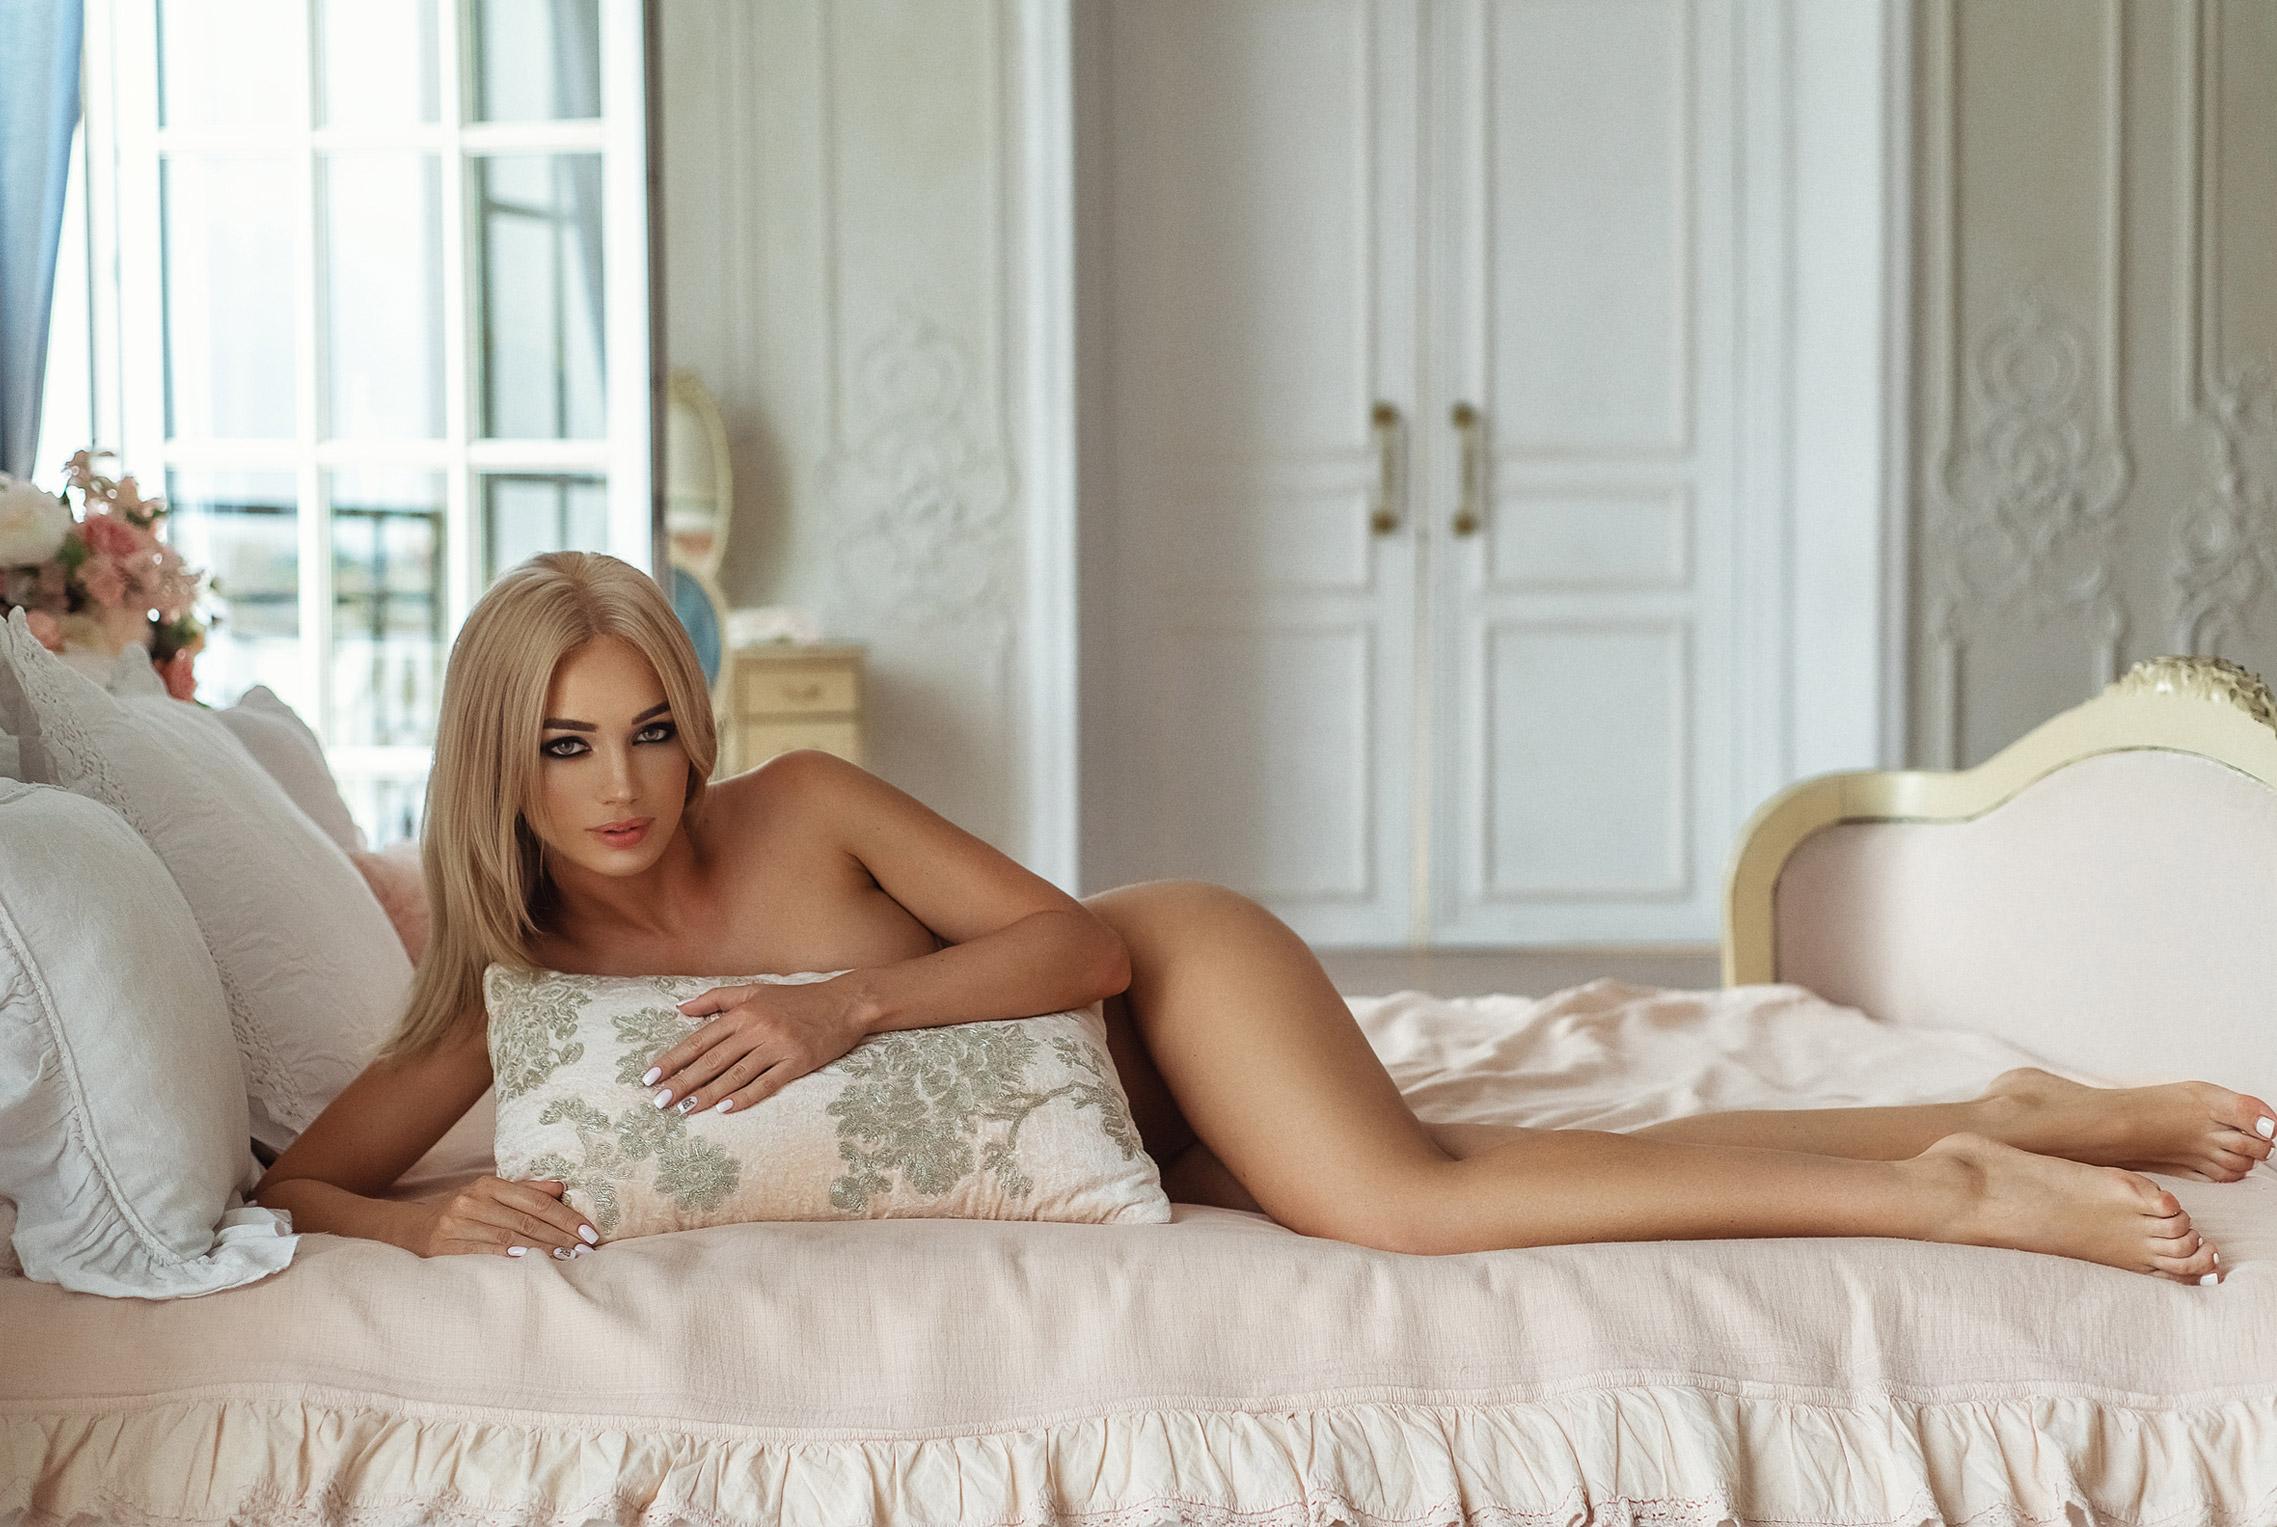 модель Аврора Шрёдер, фотограф Николас Верано / Avrora Shreder by Nikolas Verano